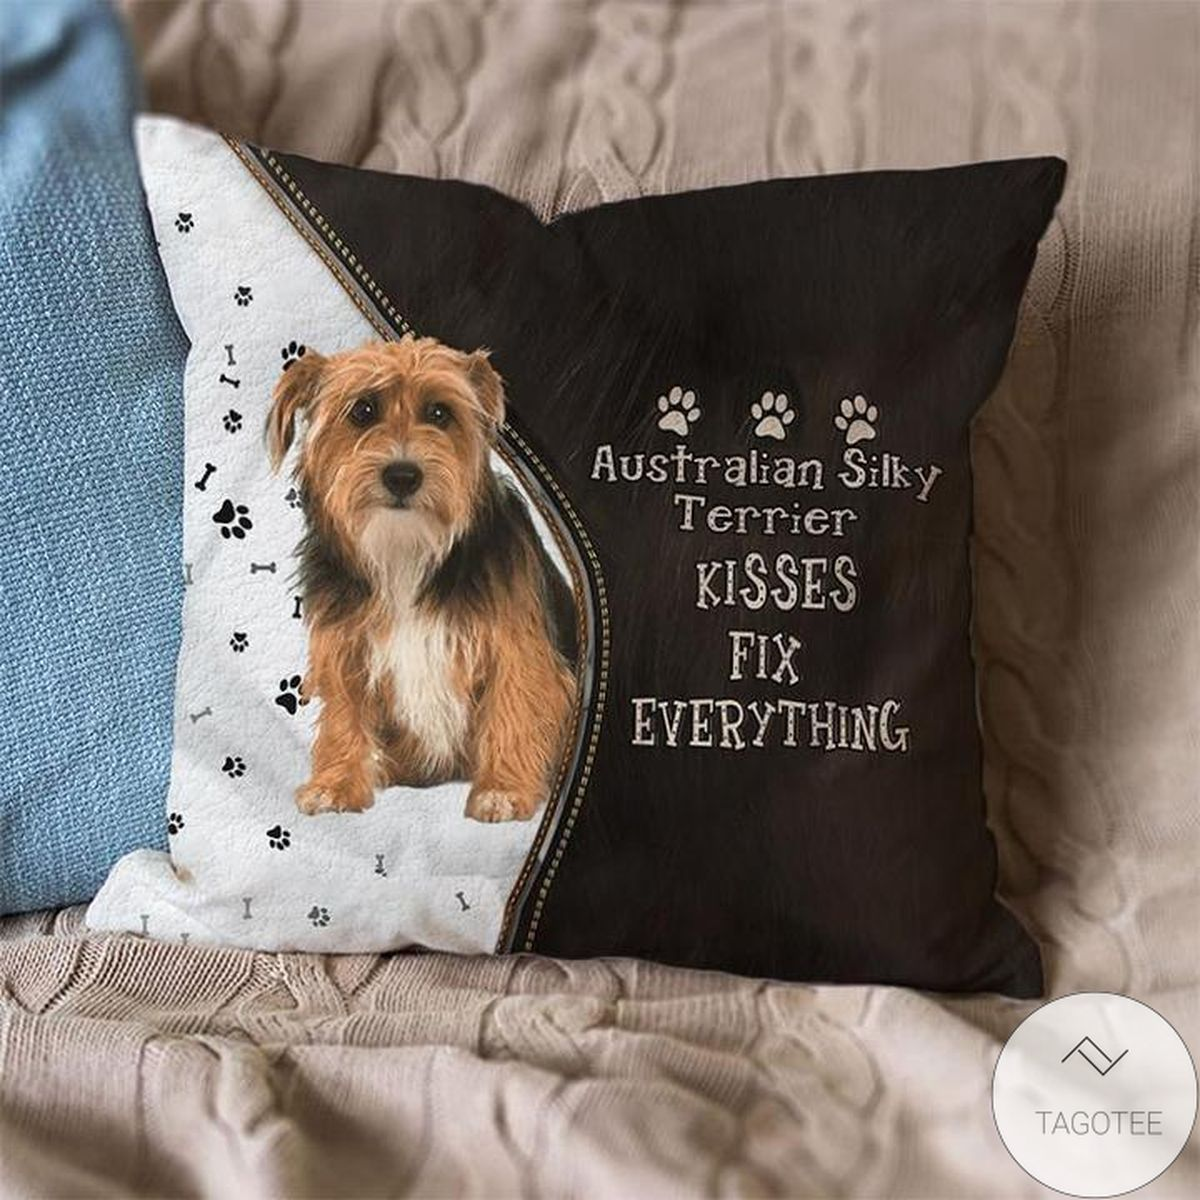 Best Shop Australian Silky Terrier Kisses Fix Everything Pillowcase